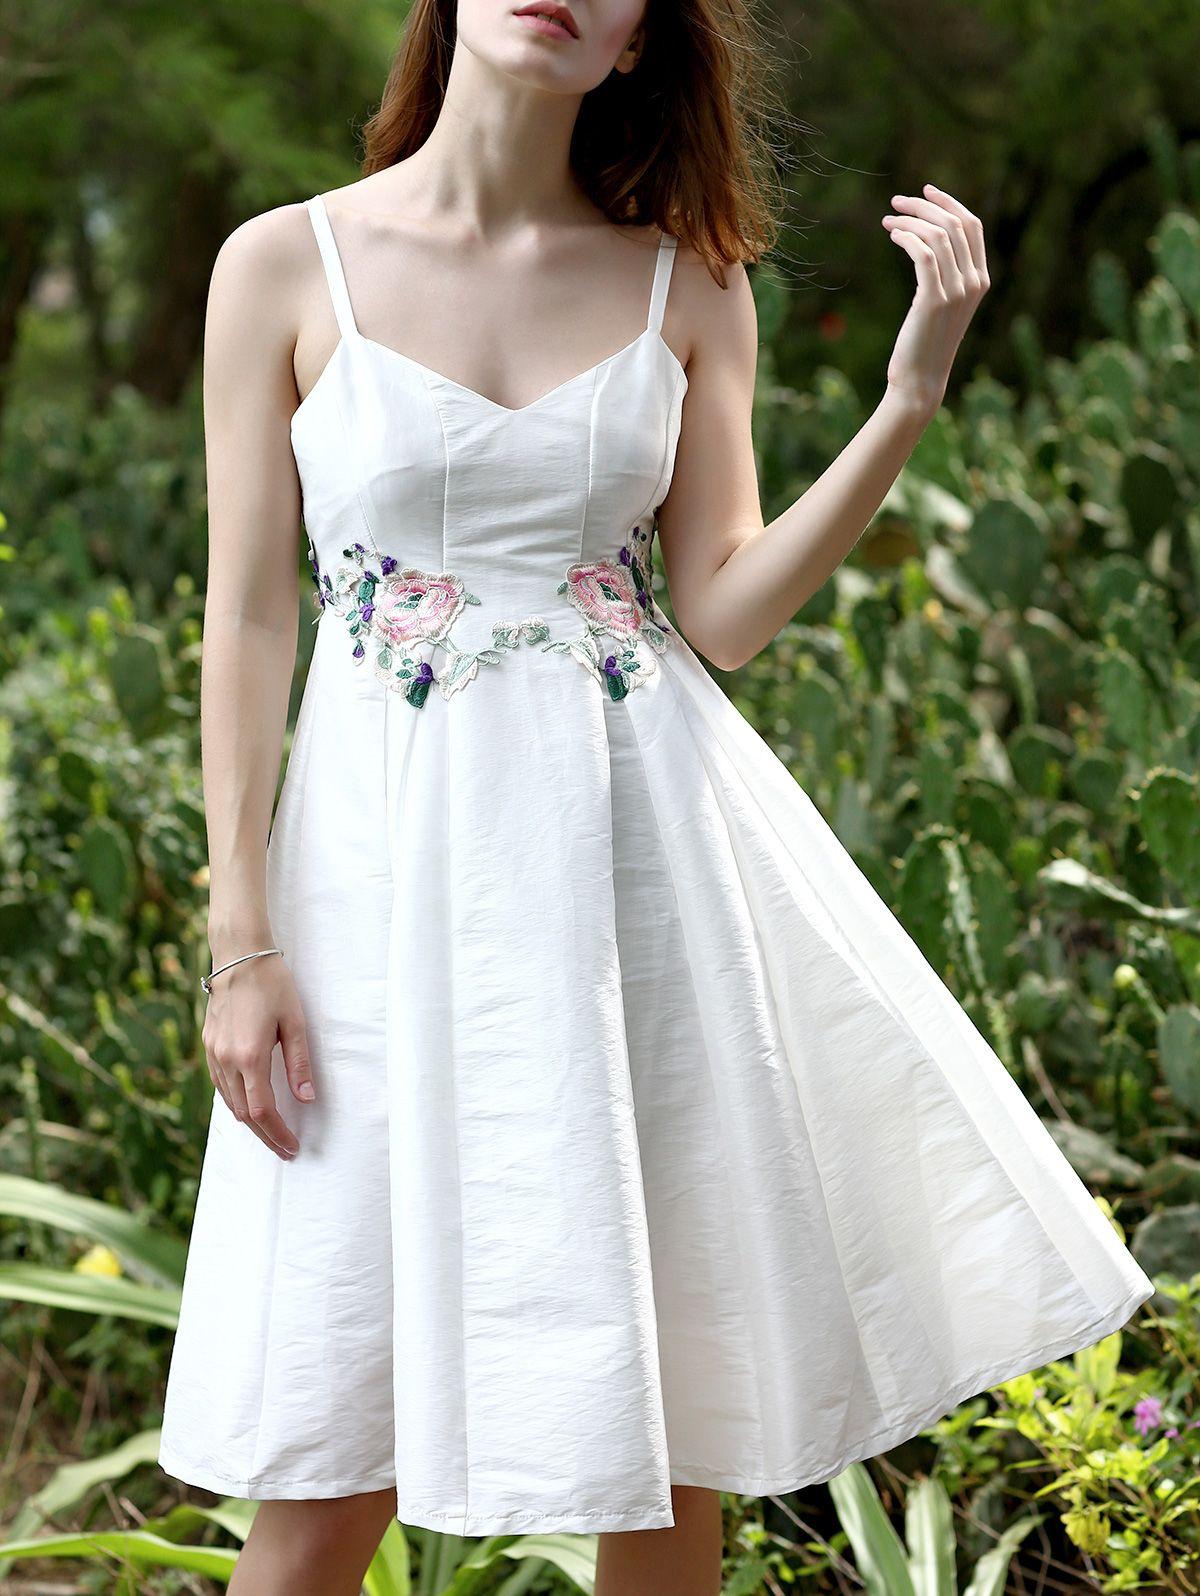 Floral Embroidery Spaghetti Straps Sleeveless Dress